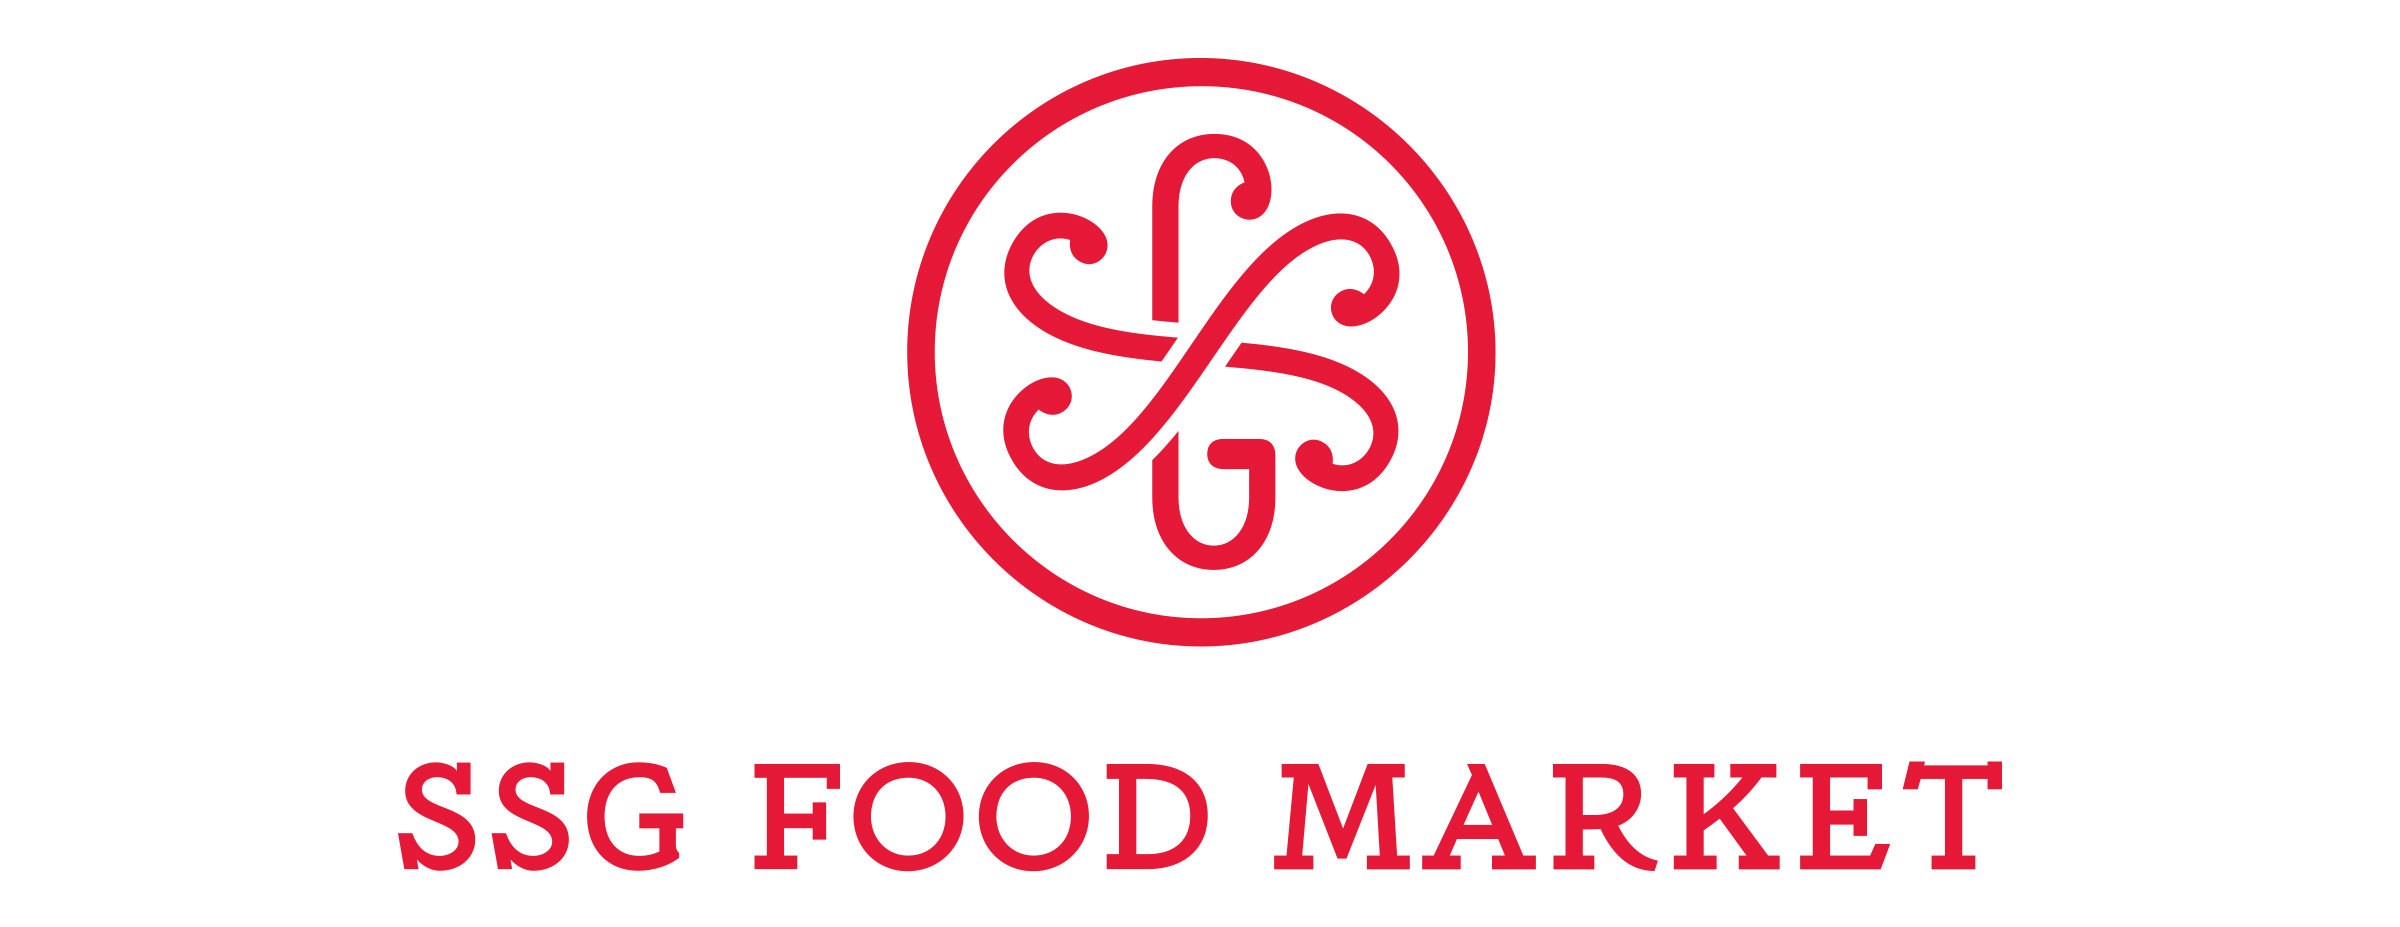 ssg logo red.jpg